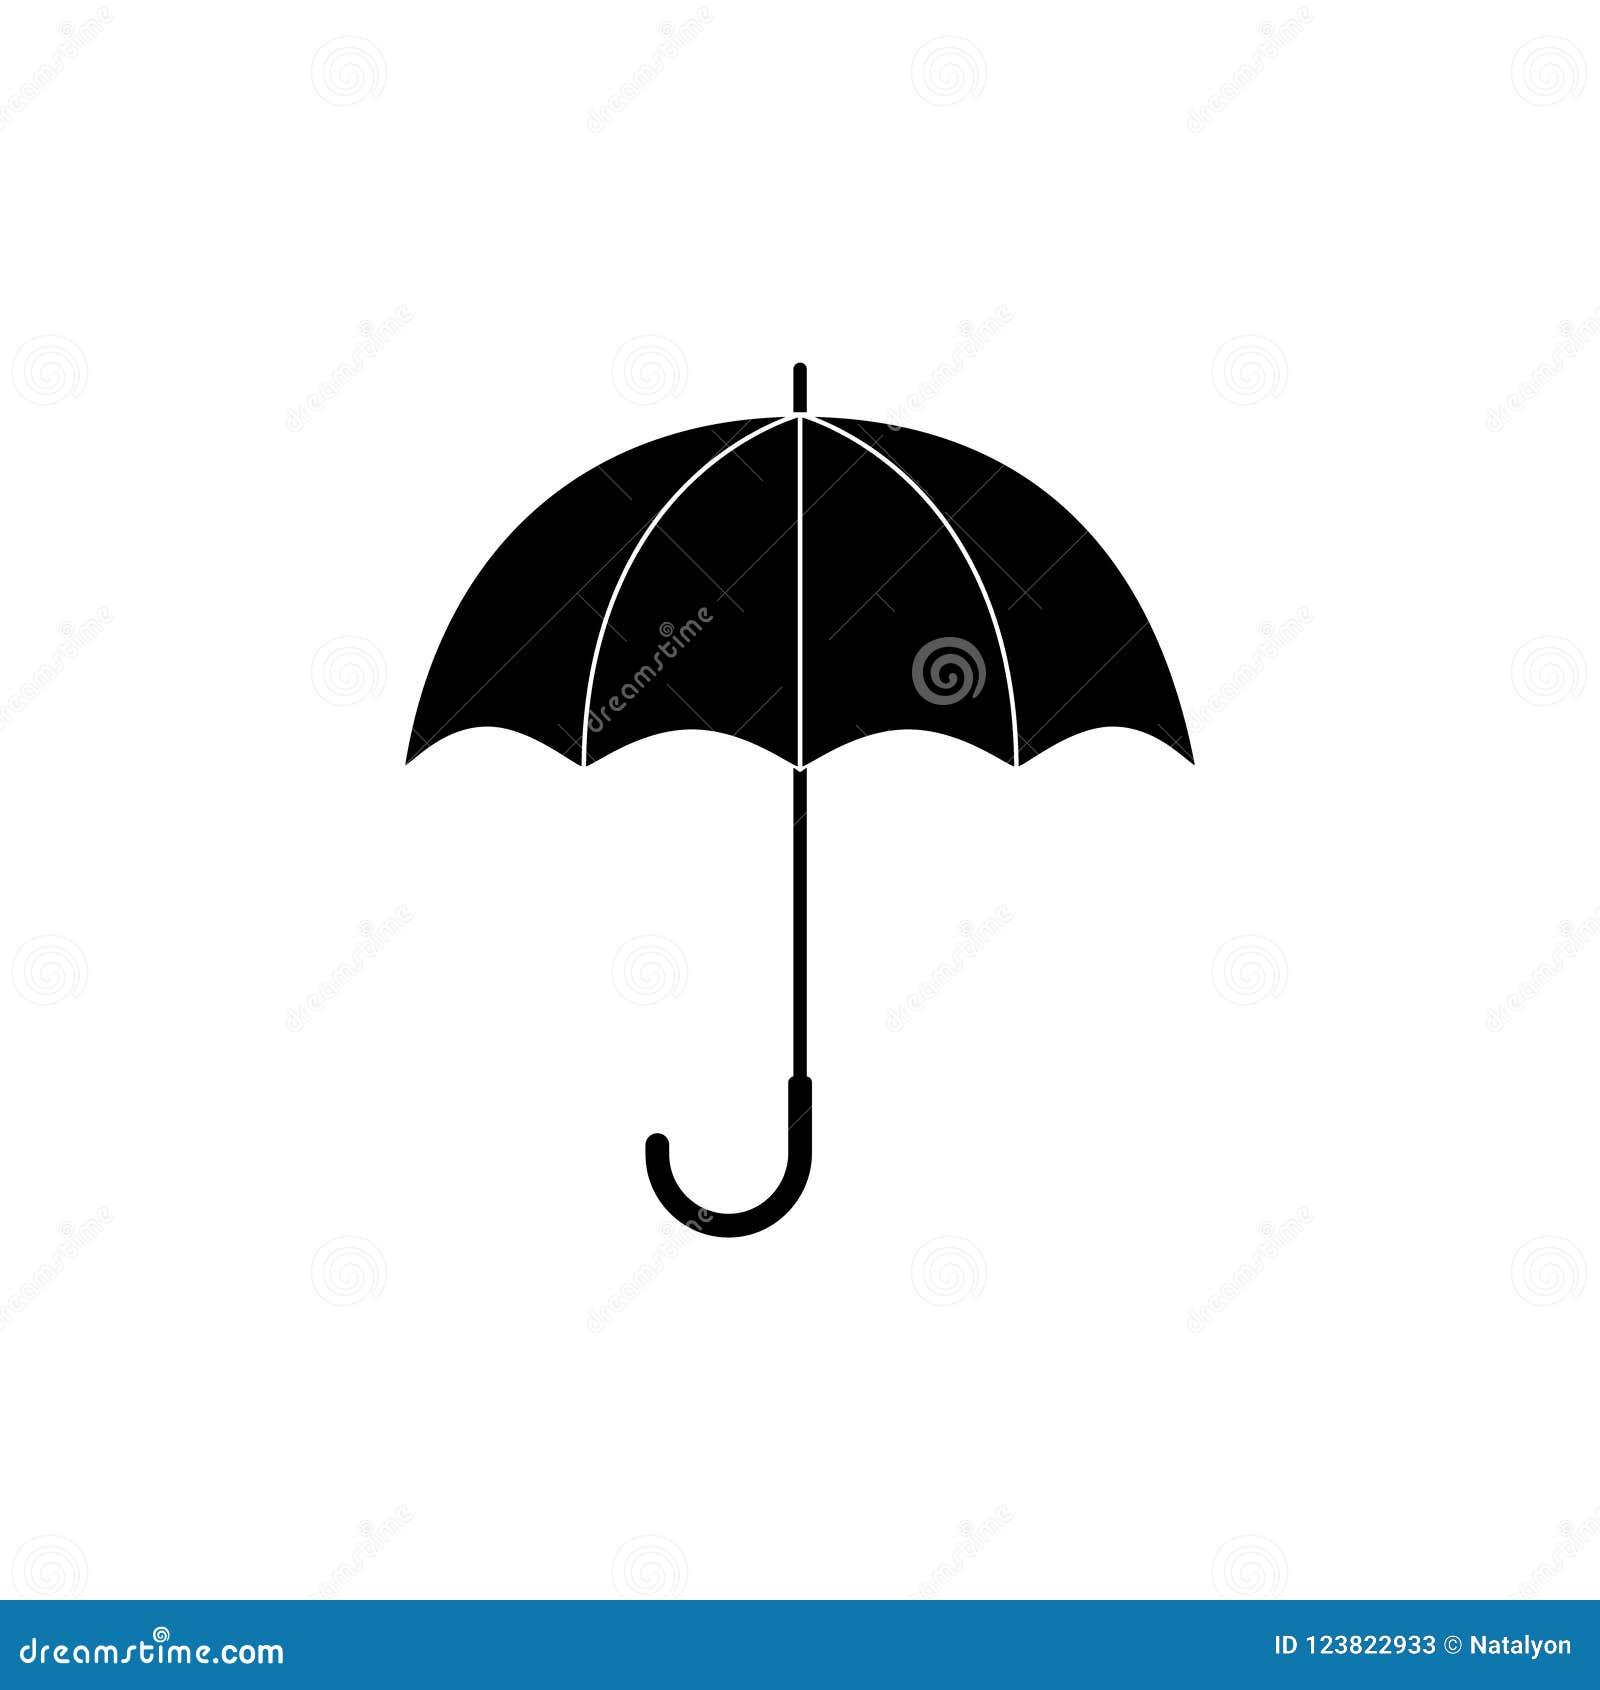 a65e1d3aace98 Black And White Simple Umbrella Silhouette, Vector Stock Vector ...